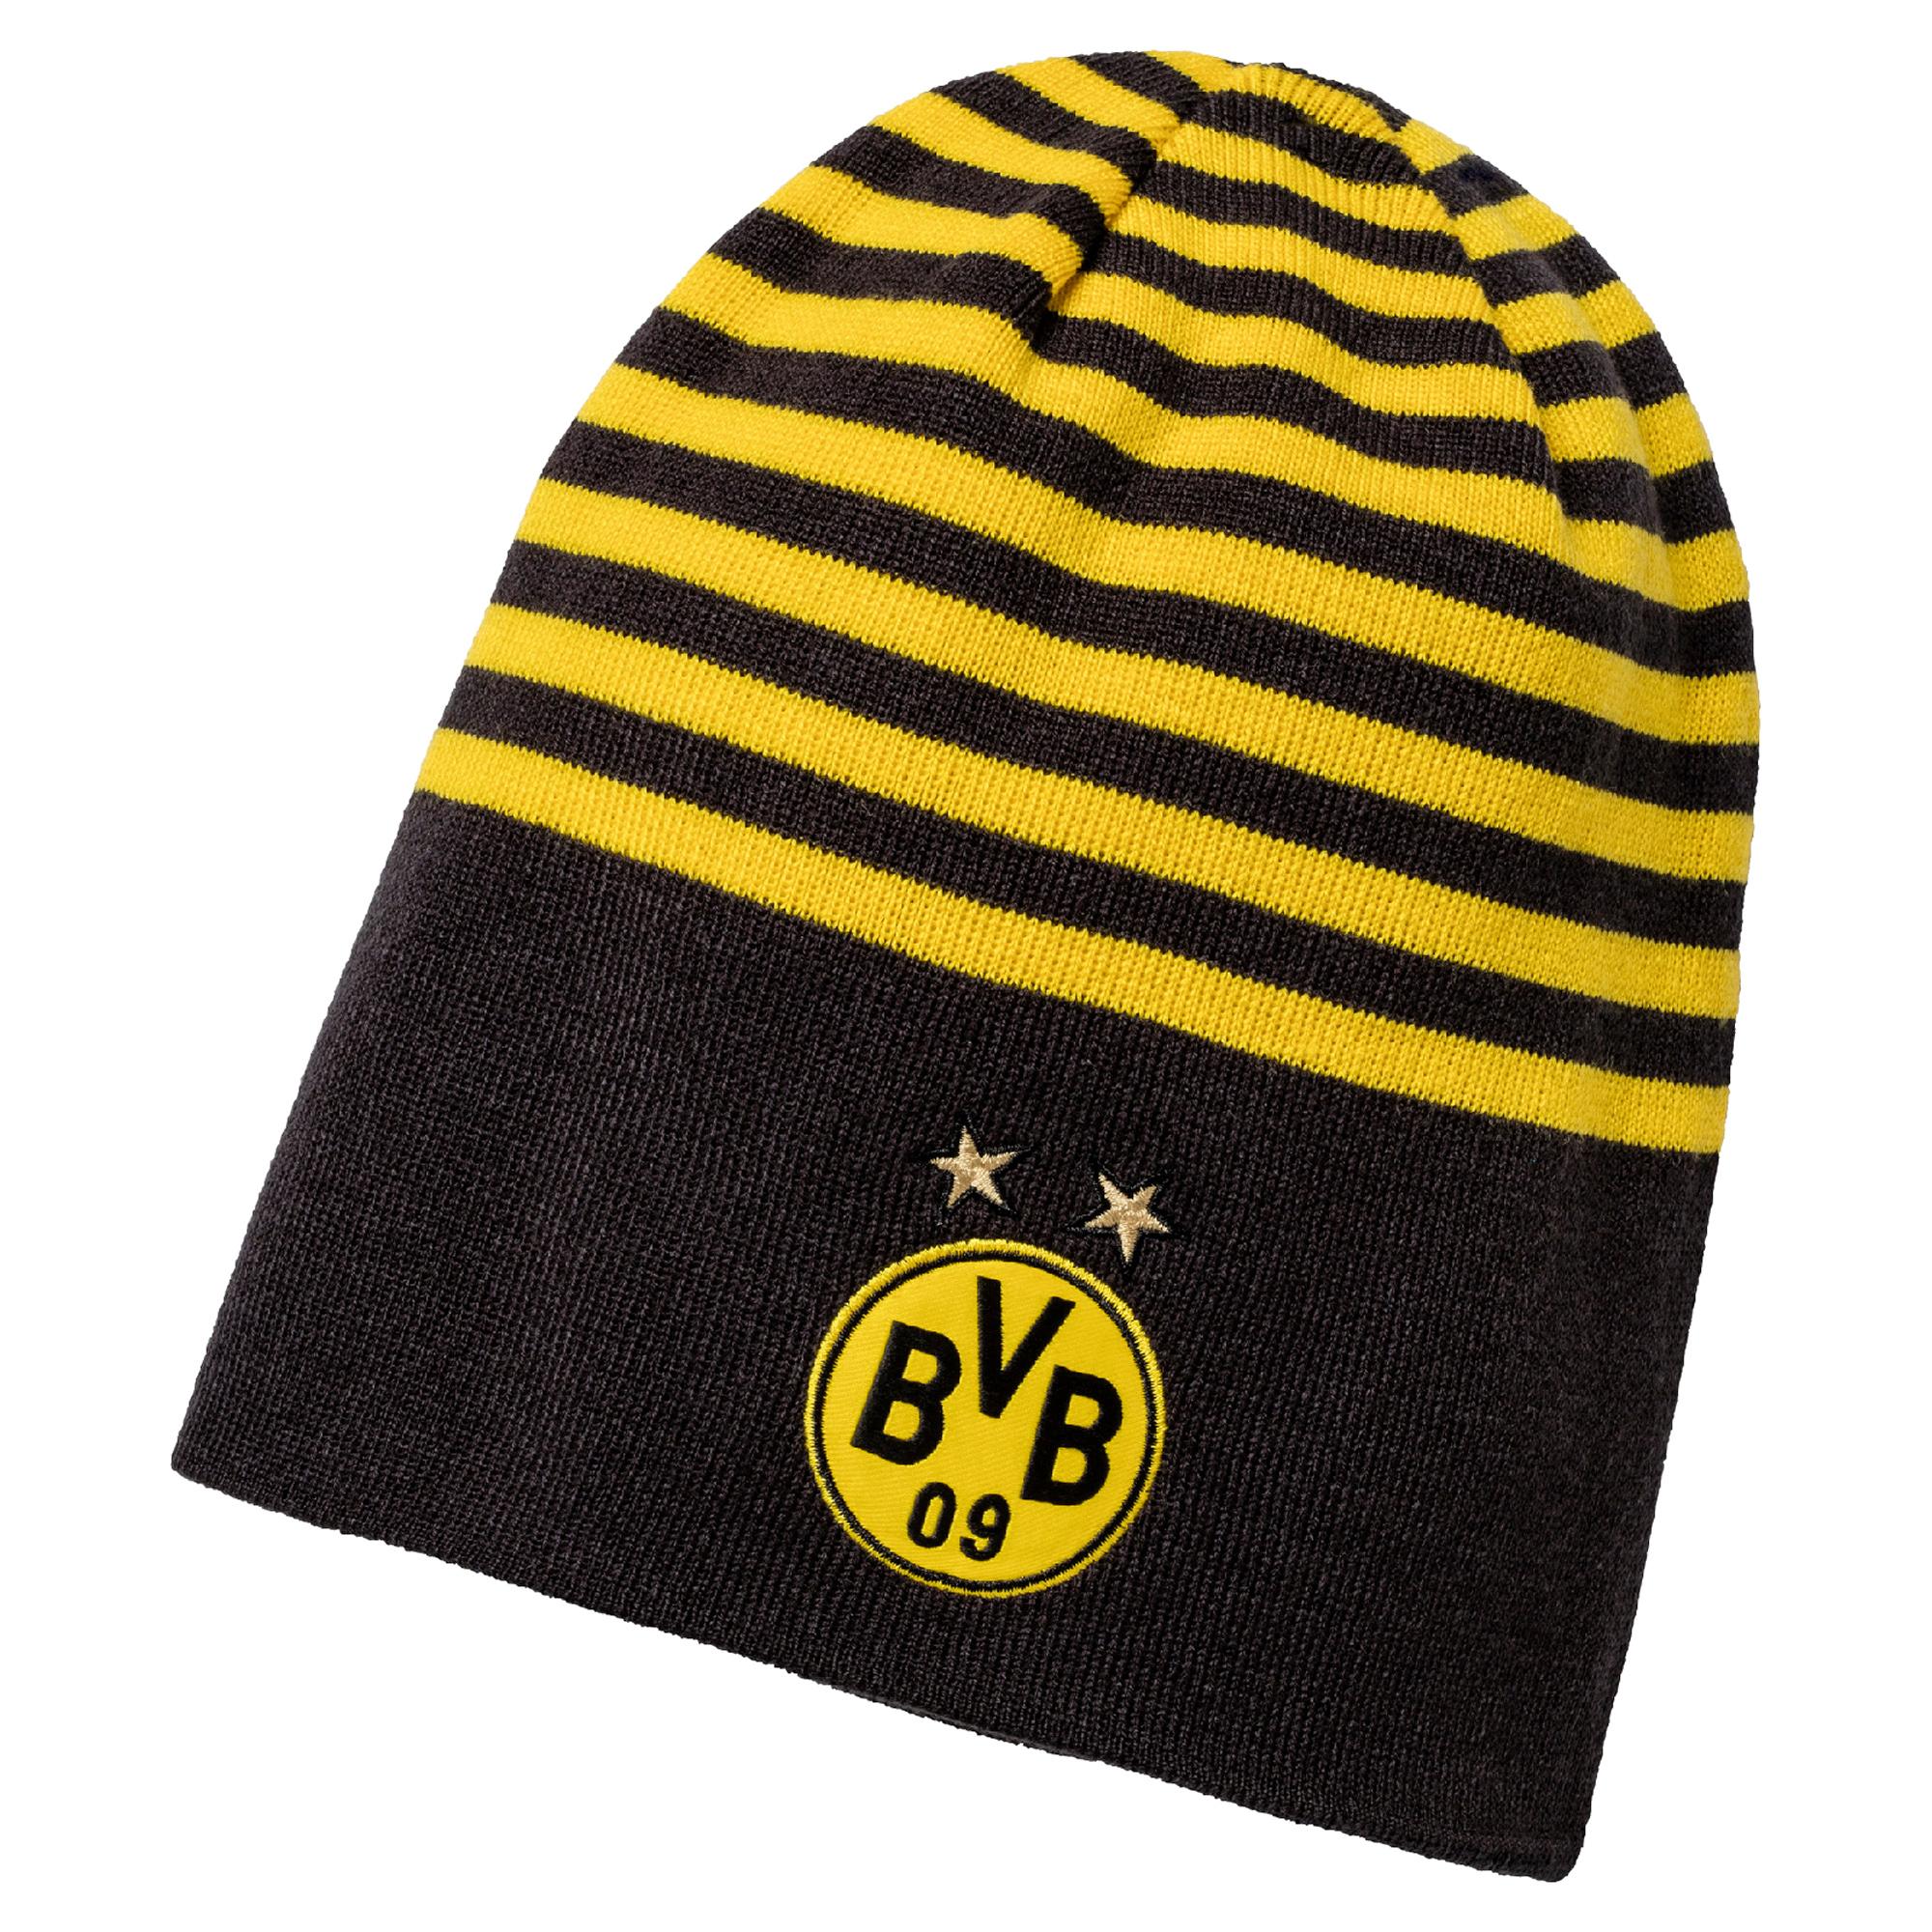 Puma BVB Borussia Dortmund Mütze BVB Reversible Beanie 021369-02